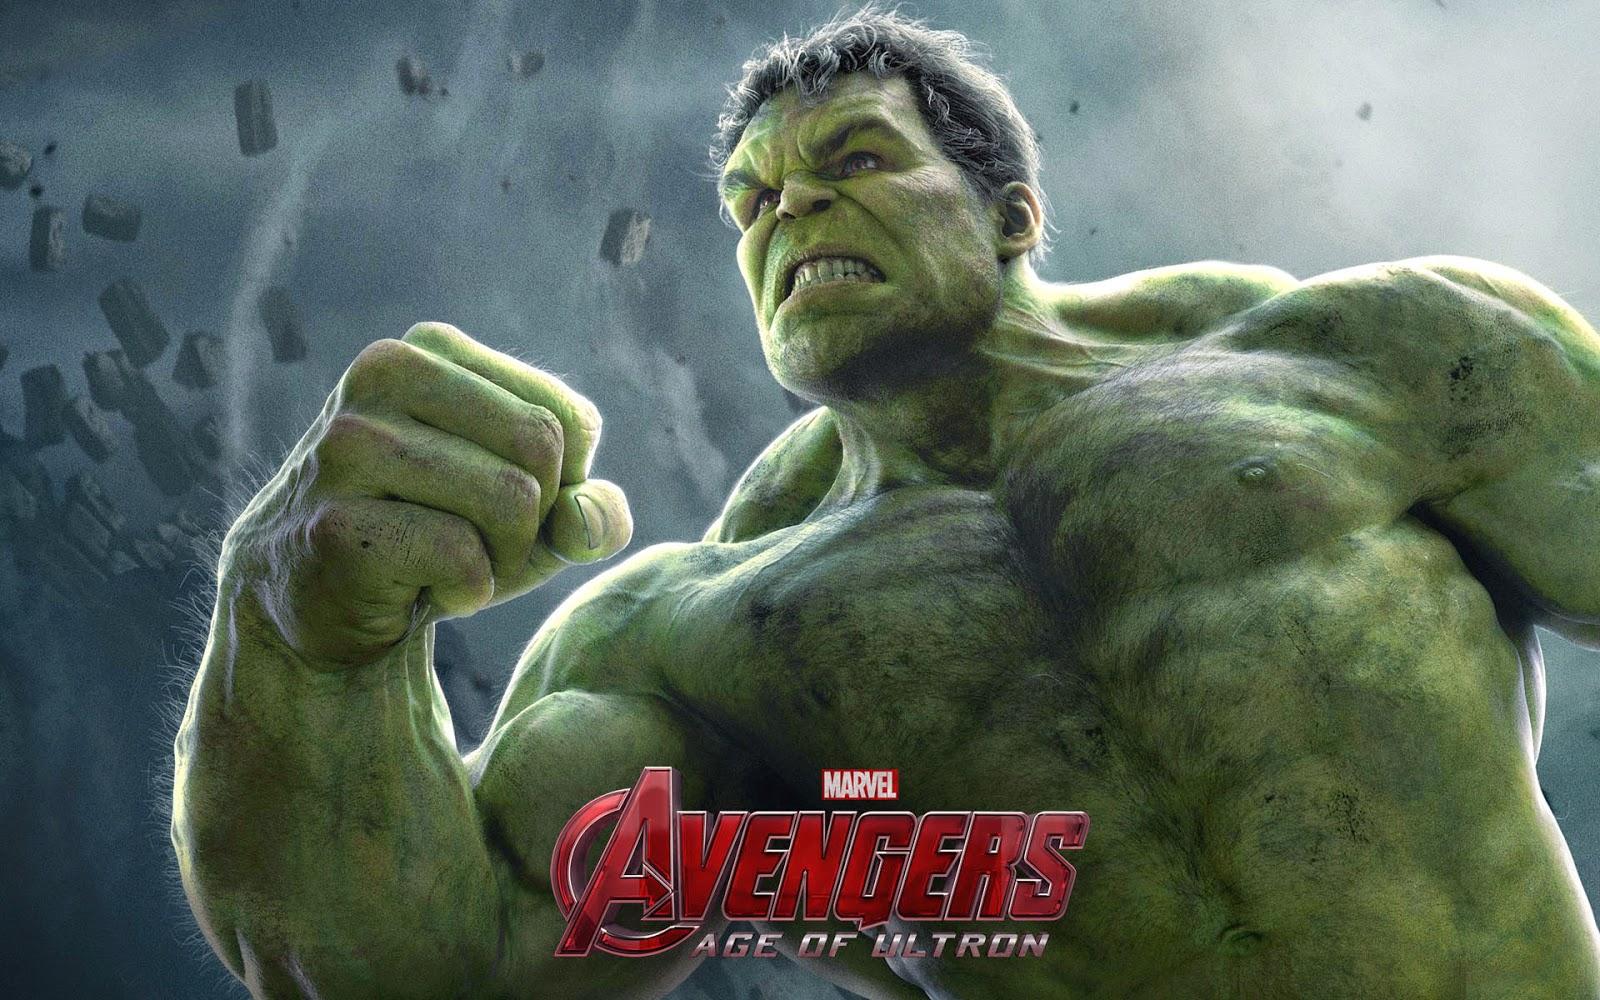 Avengers Age of Ultron 2015 Wallpaper - KFZoom  Avengers Wallpaper Hd Hulk